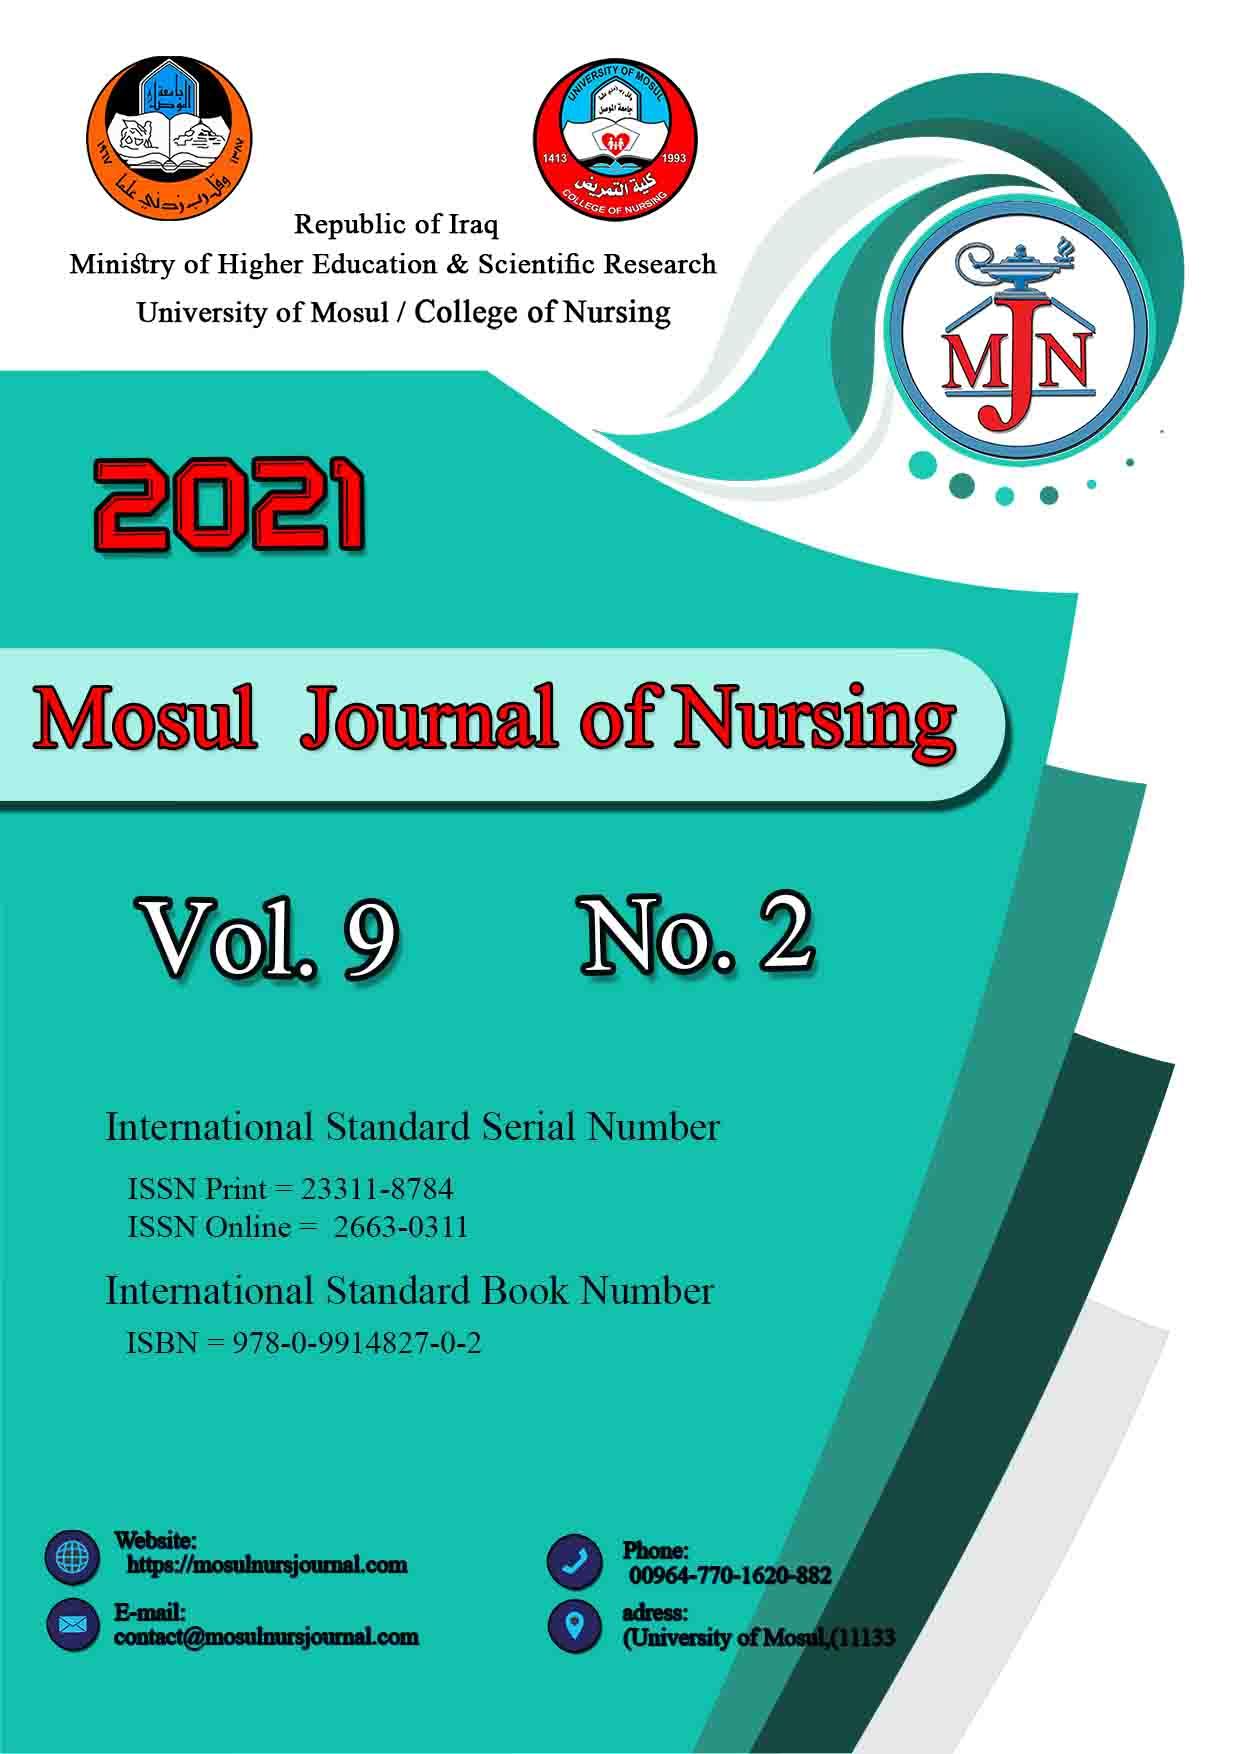 Mosul Journal of Nursing